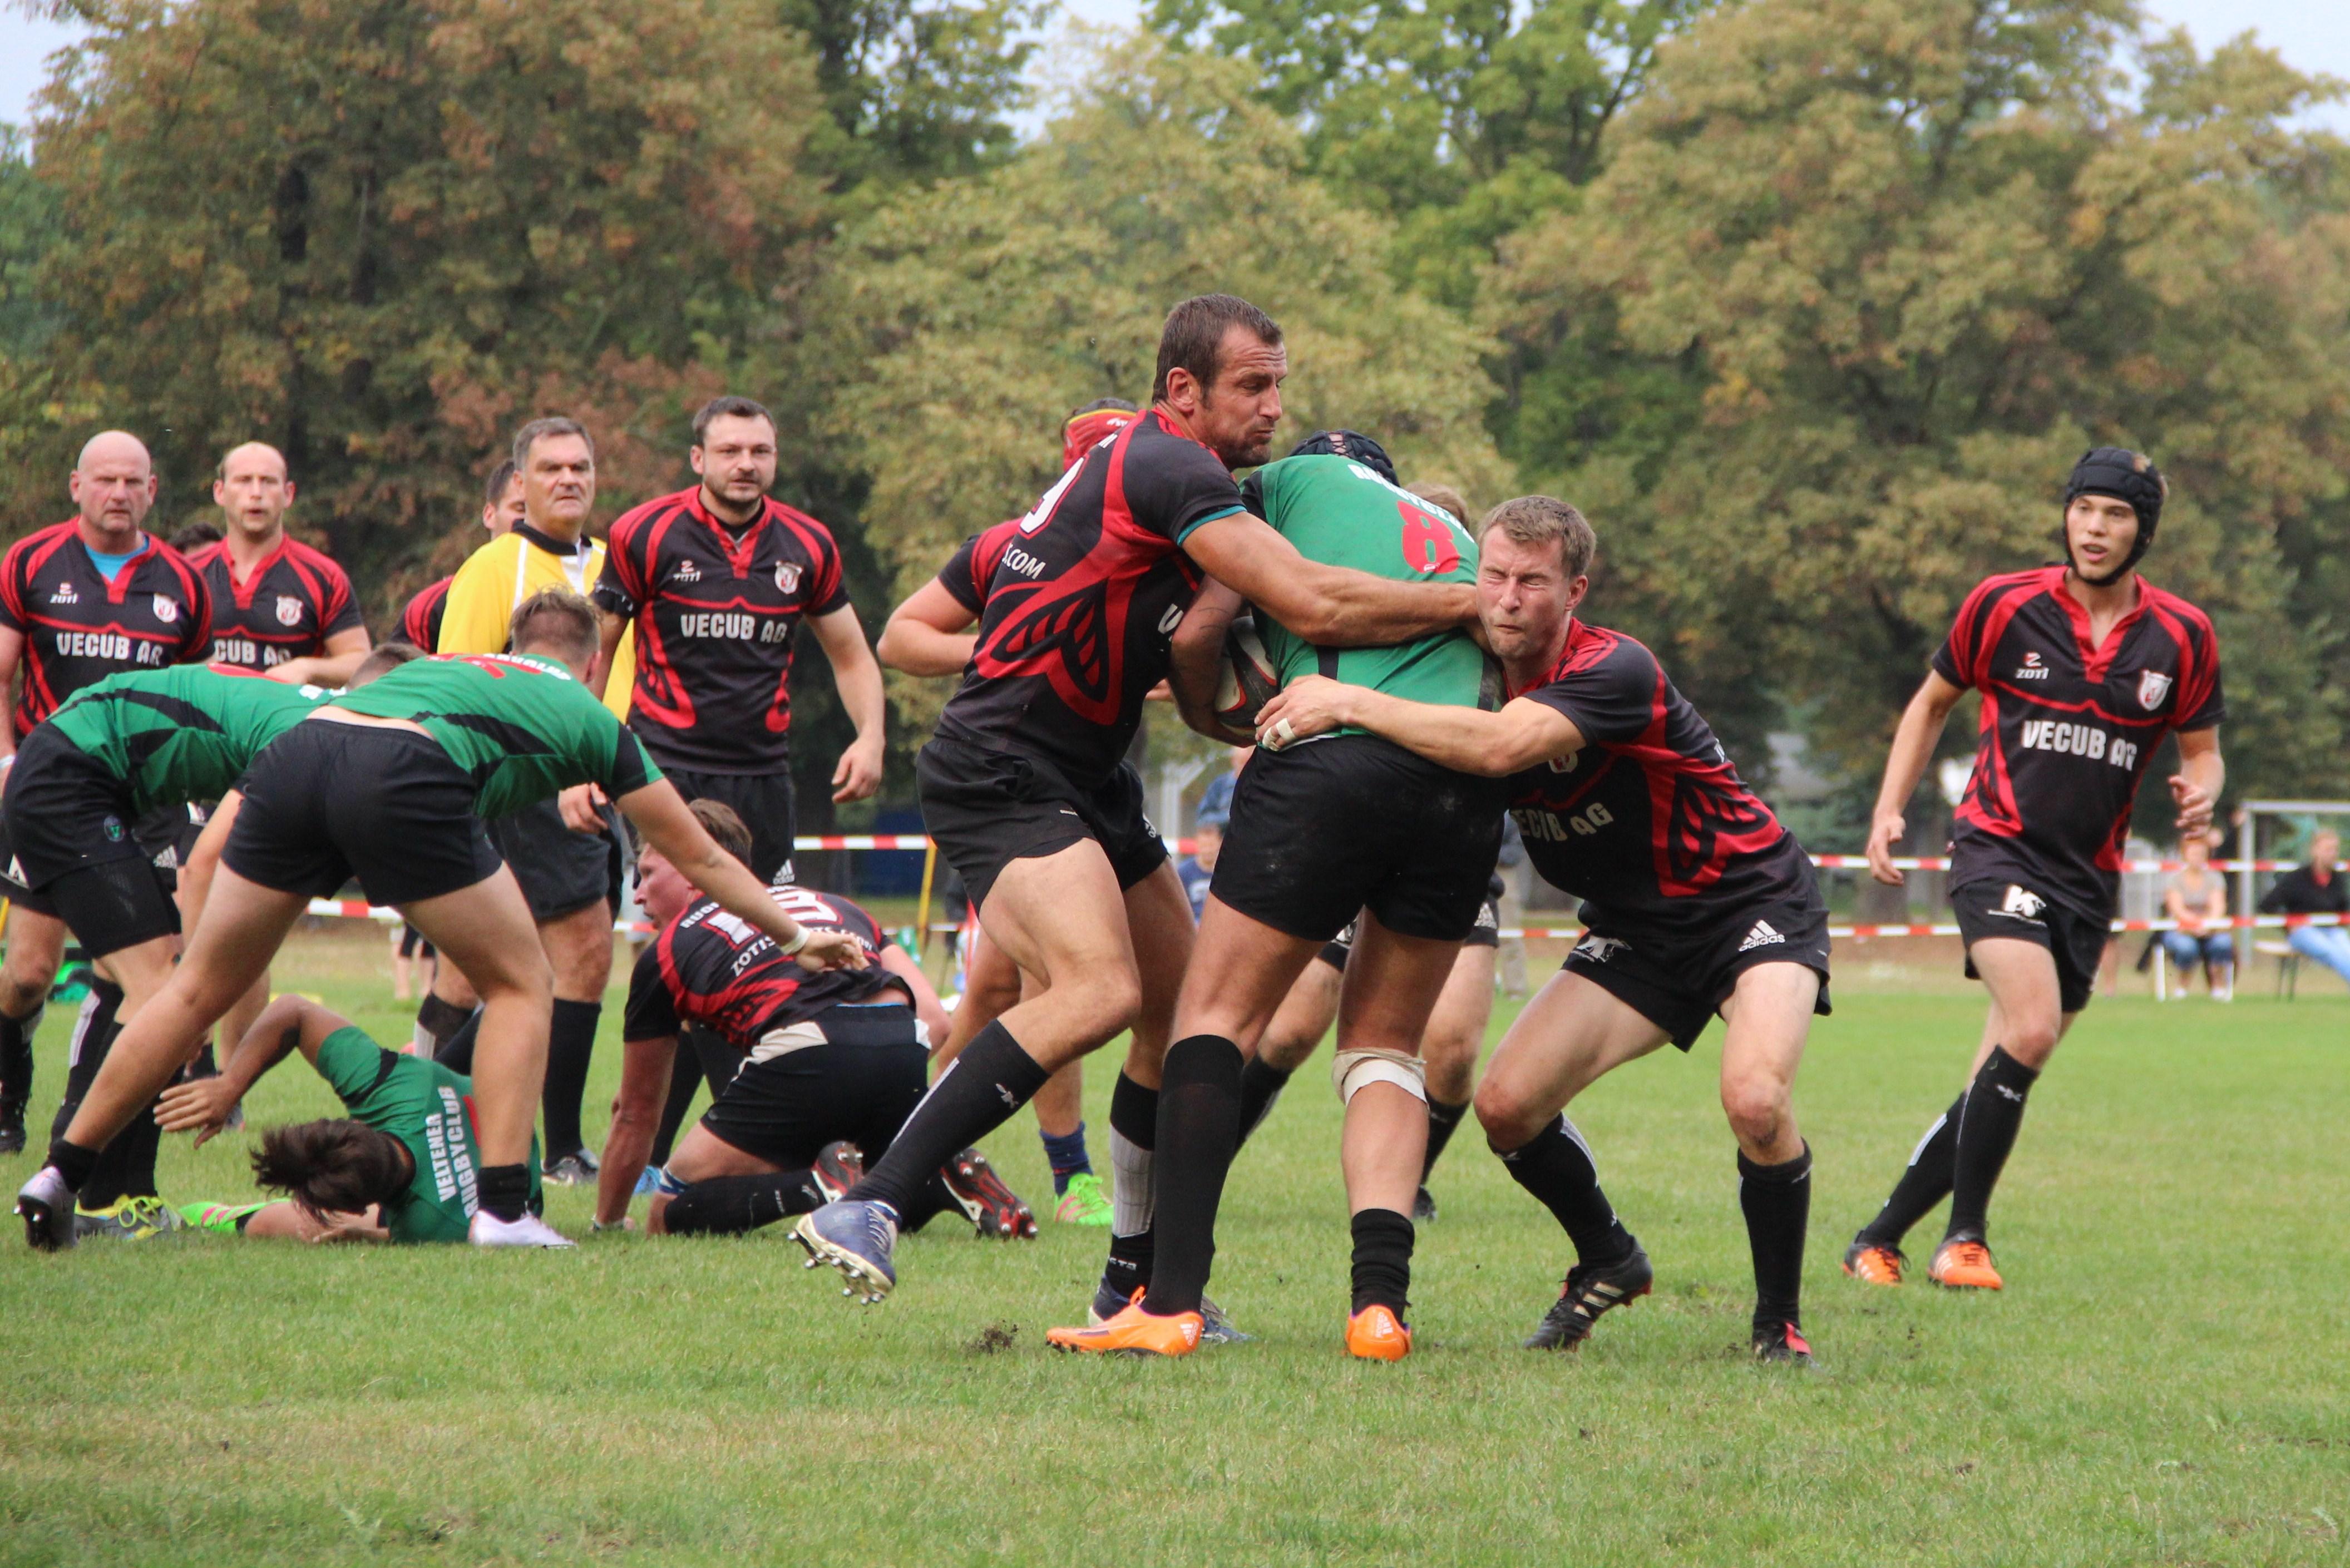 Rugby 17.9.2016 U.M.067